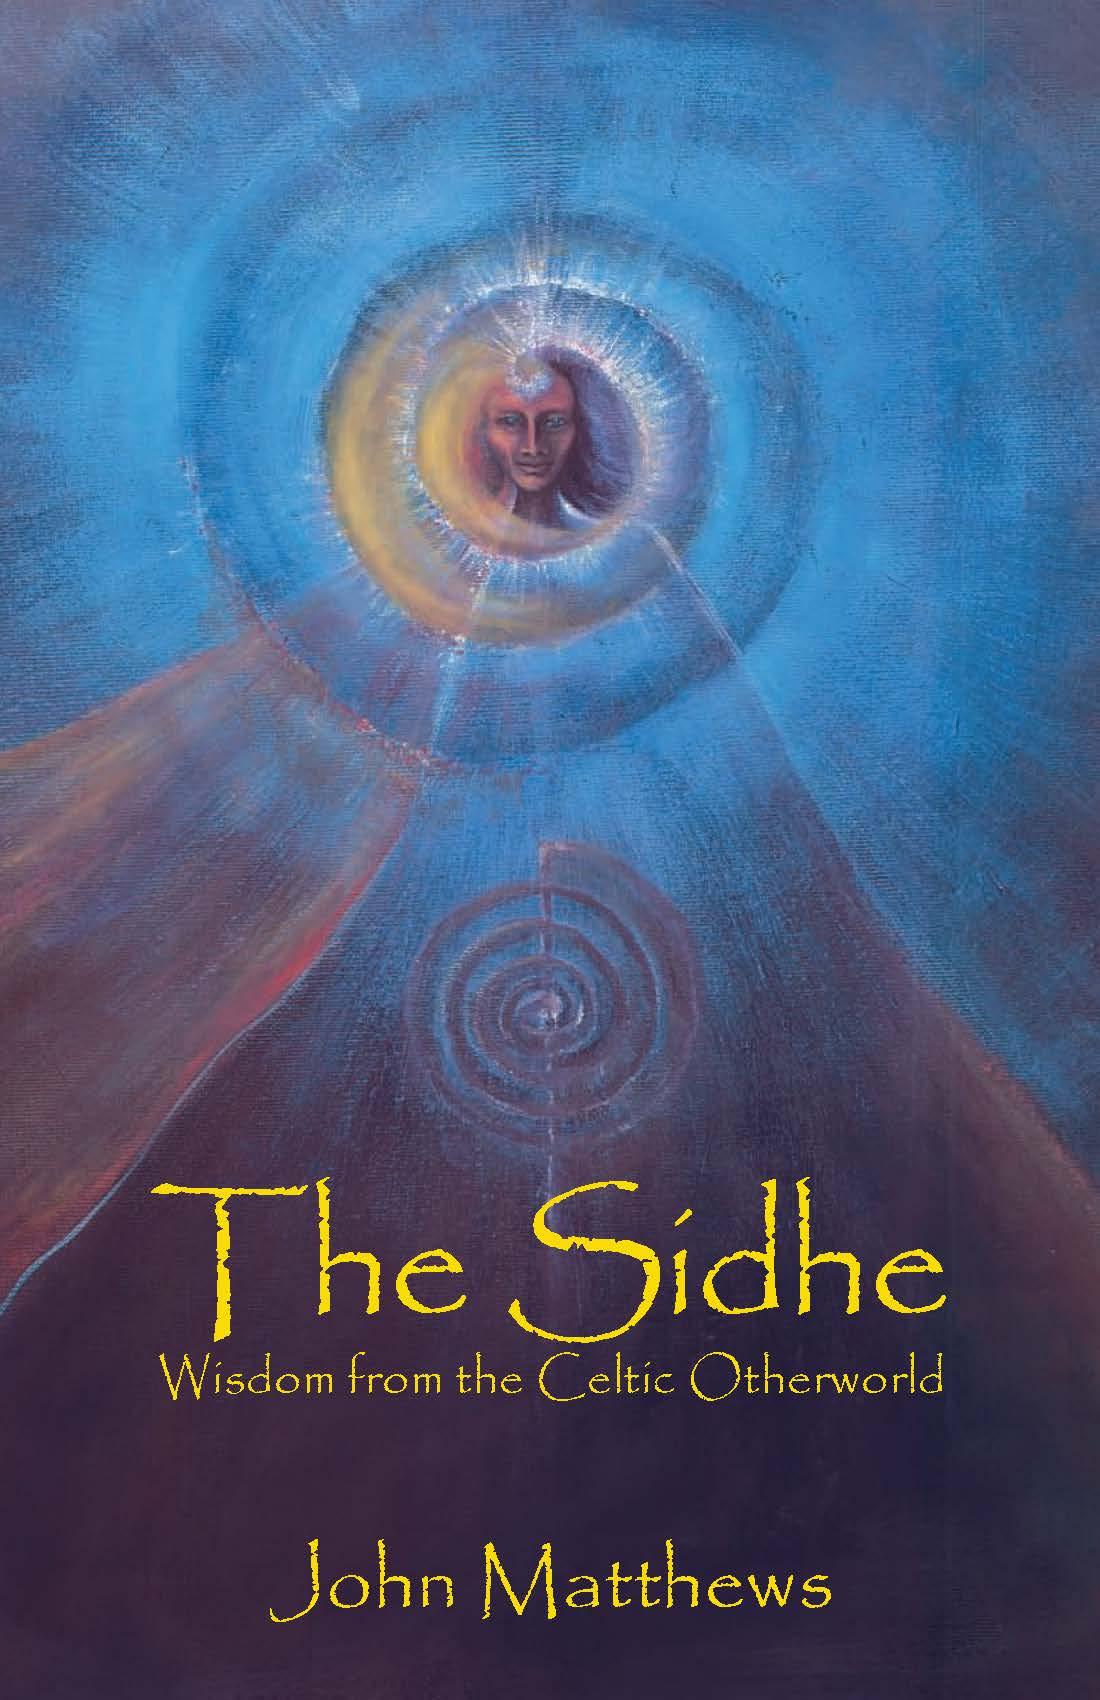 The Sidhe - Wisdom from the Celtic Otherworld - John Matthews